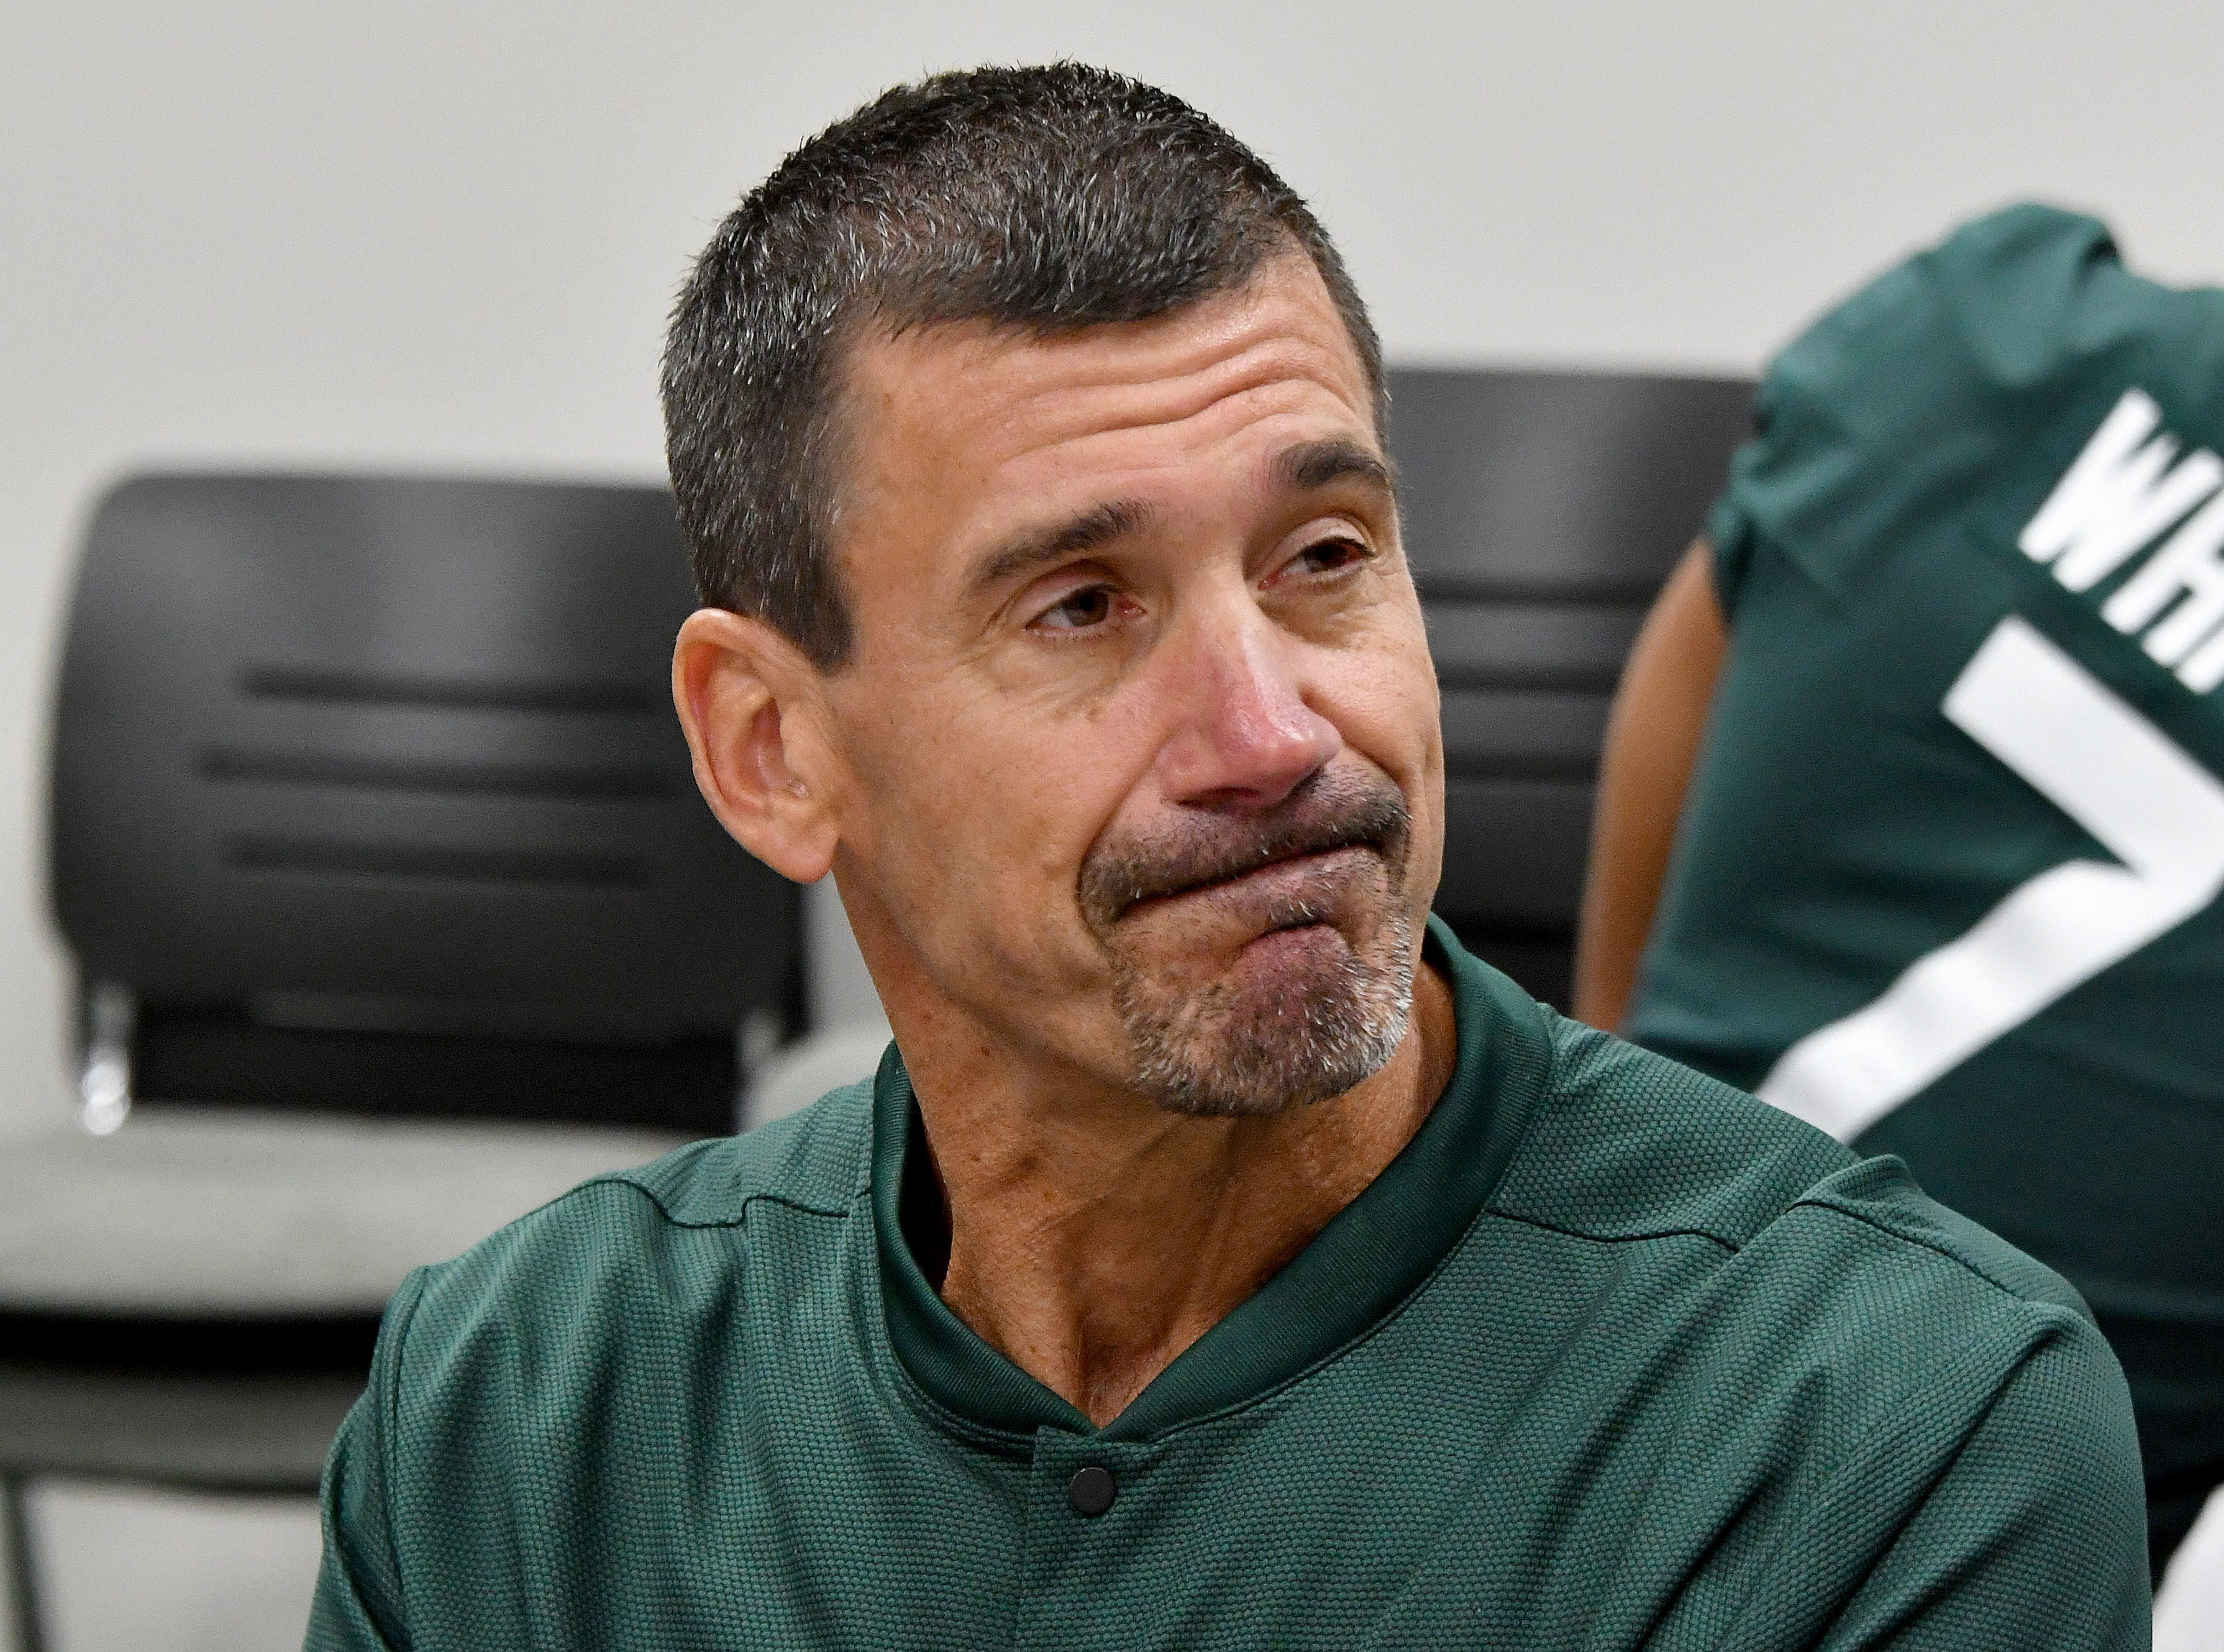 Quarterbacks coach Brad Salem makes a face as he ponders a question by a reporter.